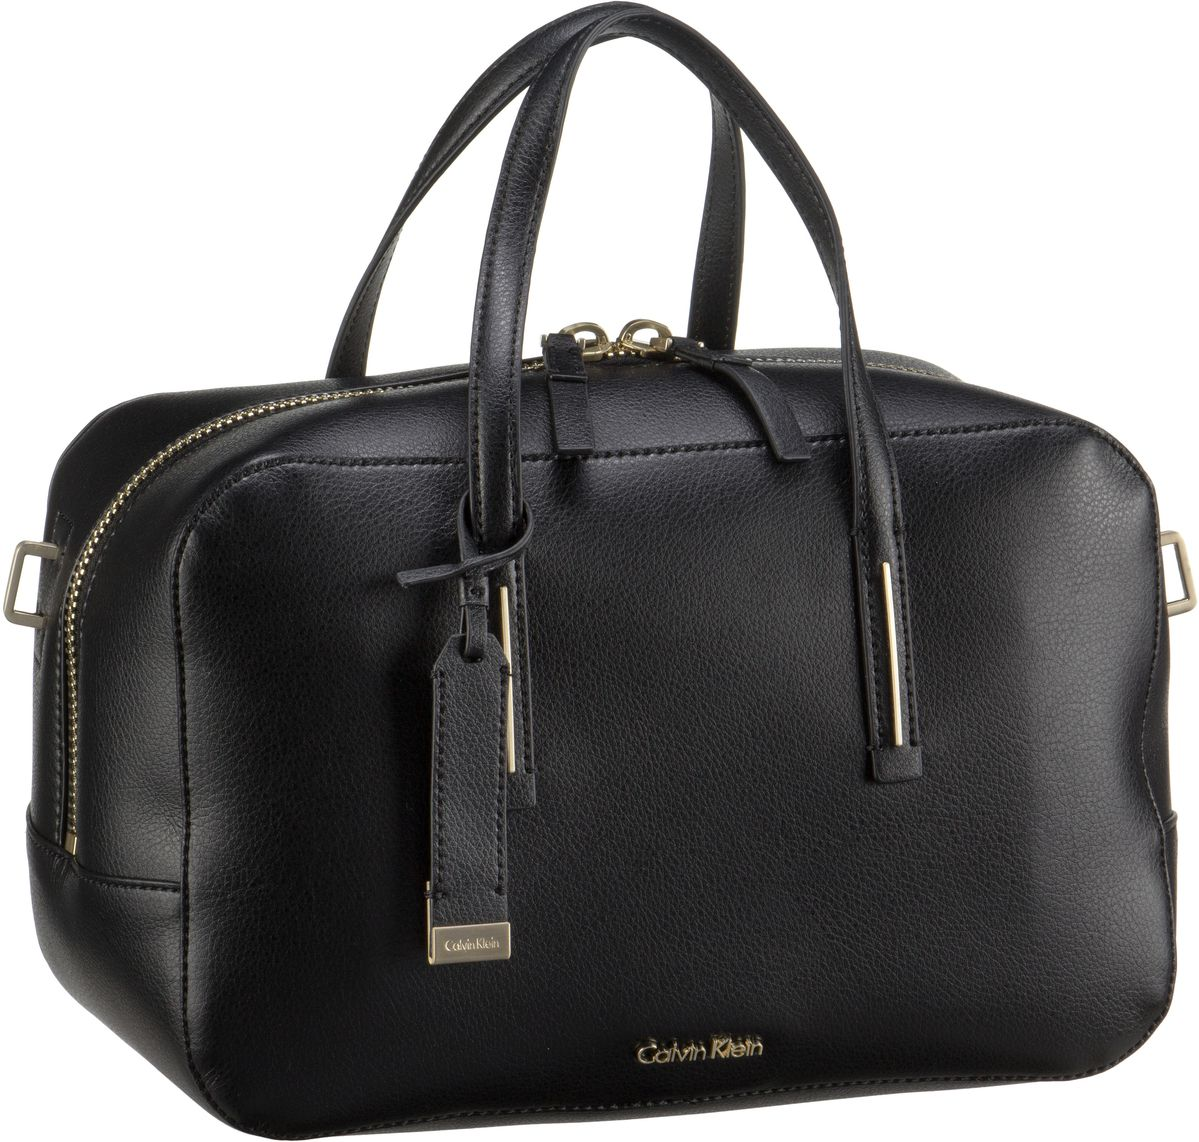 Handtasche Frame Duffle Black